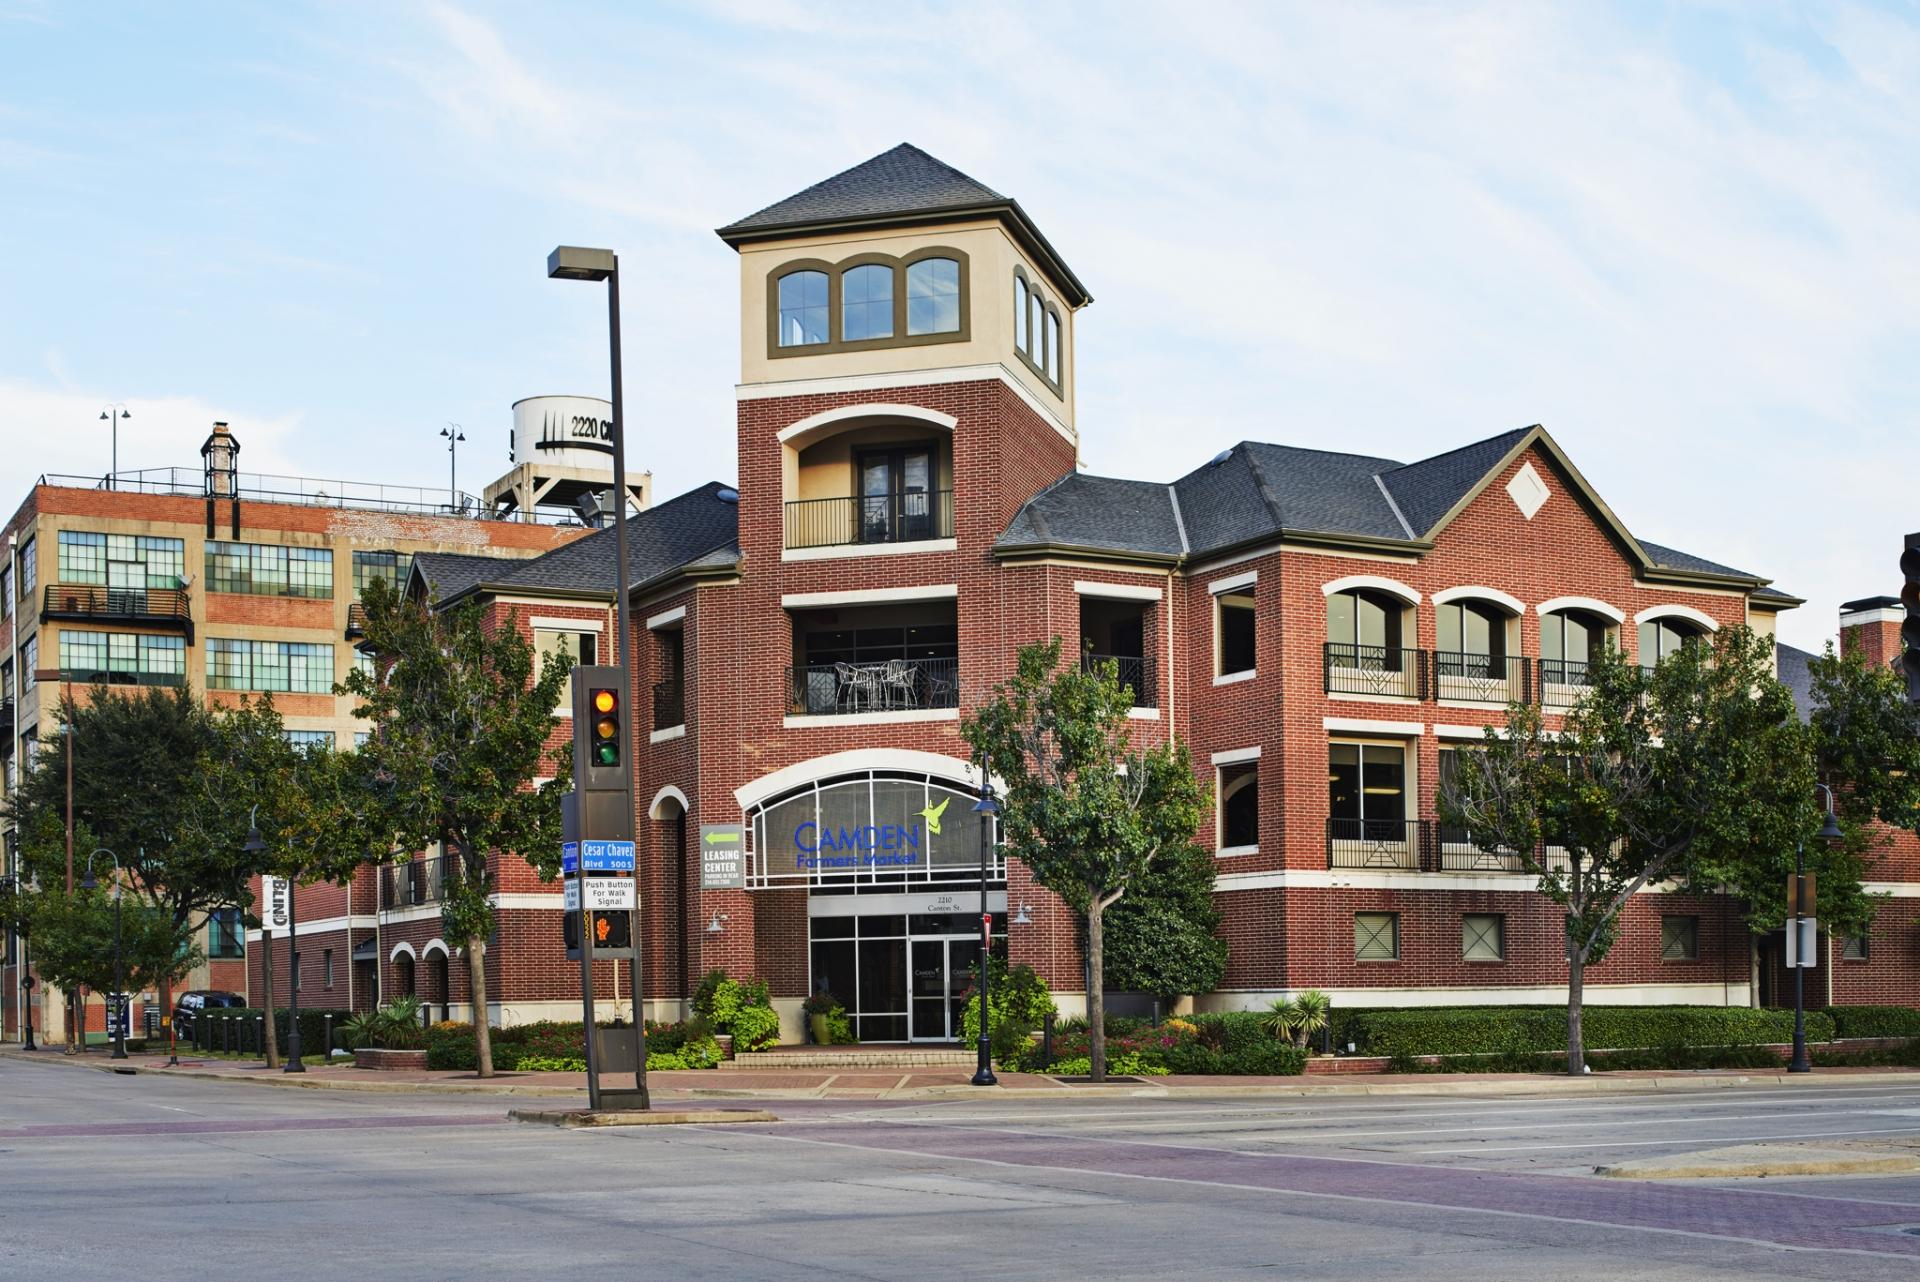 Camden Farmers Market Apartments image 33